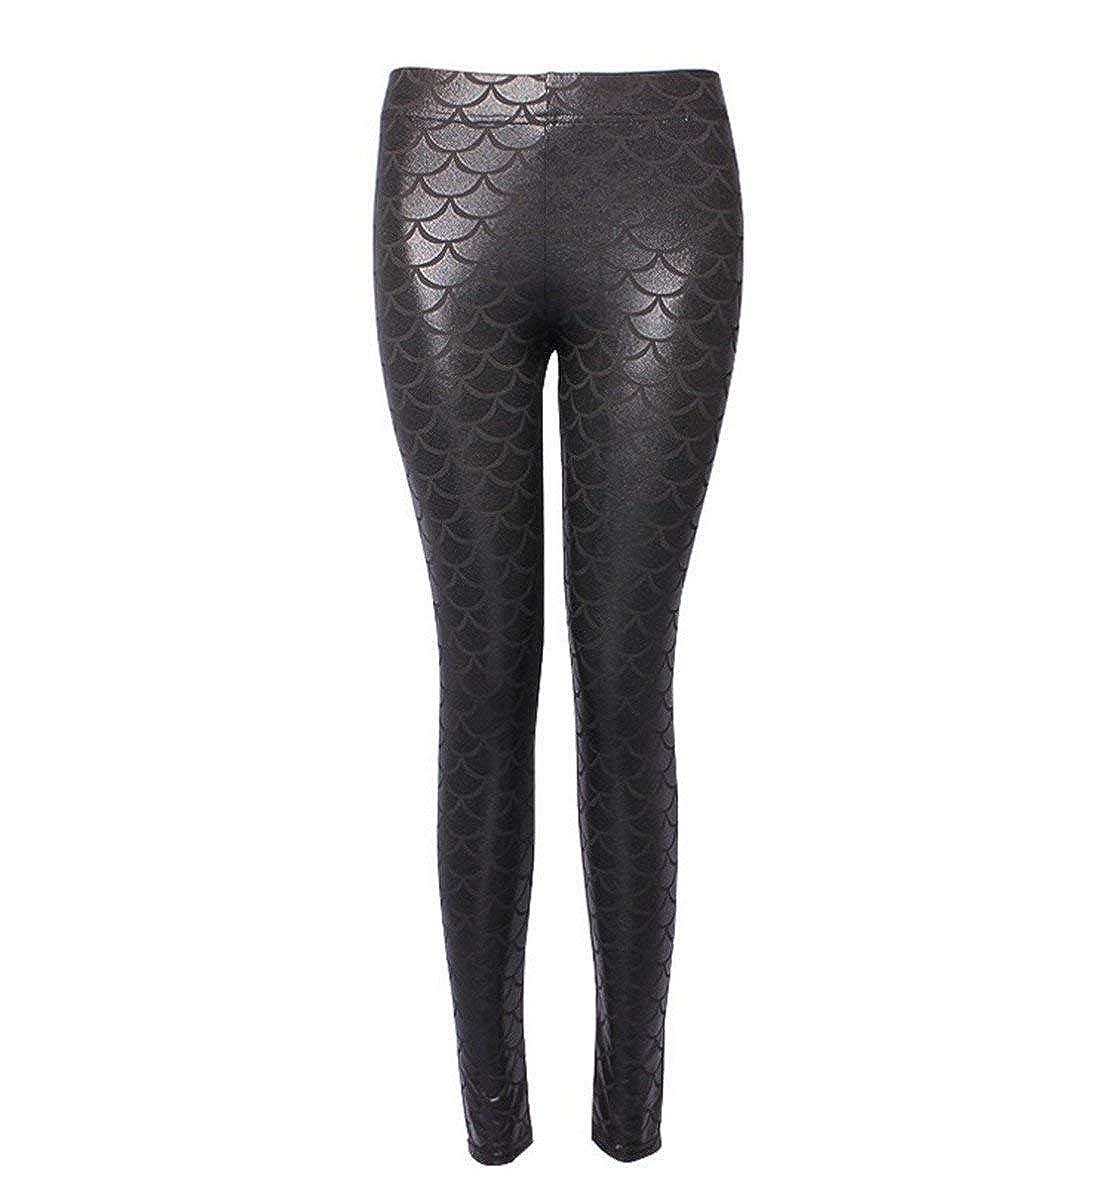 BOLAWOO Leggings Jeggings Treggings Crayon Pantalon de Stretch Fête Style Pants  Femmes Femmes Pantalons Longues Taille Haute Slim ... 7568b2db588